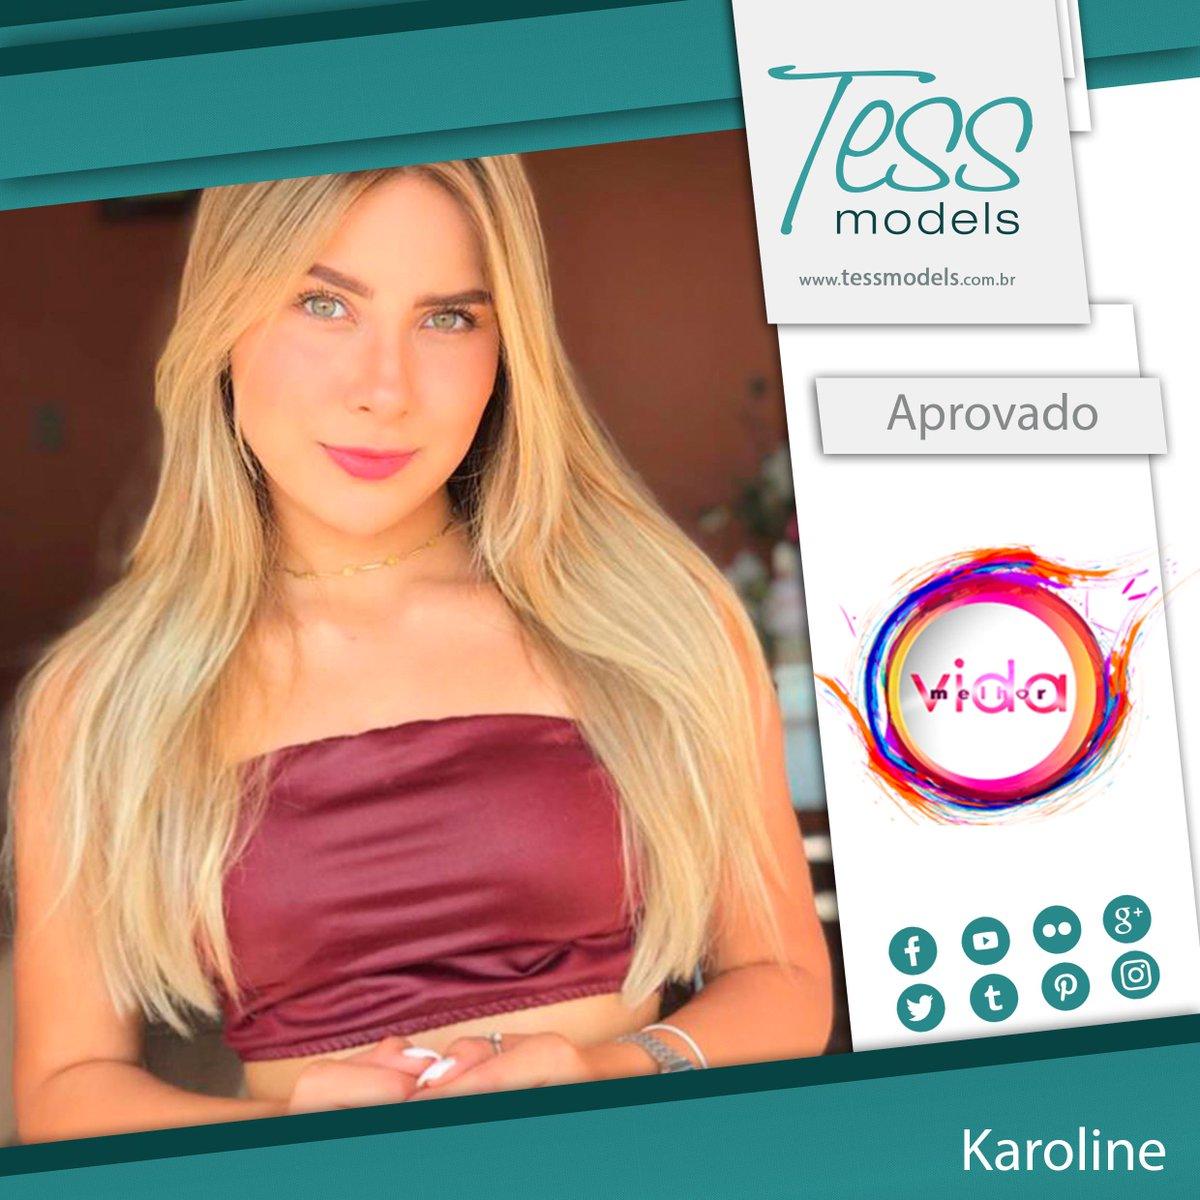 A modelo Karoline foi aprovada para uma pauta no programa Vida Melhor, Rede Vida. Parabéns <3  http://tessmodels.com.br/cadastro  #TessModels #modelo #fashion #photography #modelos #vidadeadulto #moda #decor #love #modeloffduty #modeloftheday #photooftheday #beauty #decoradulto #topmodel